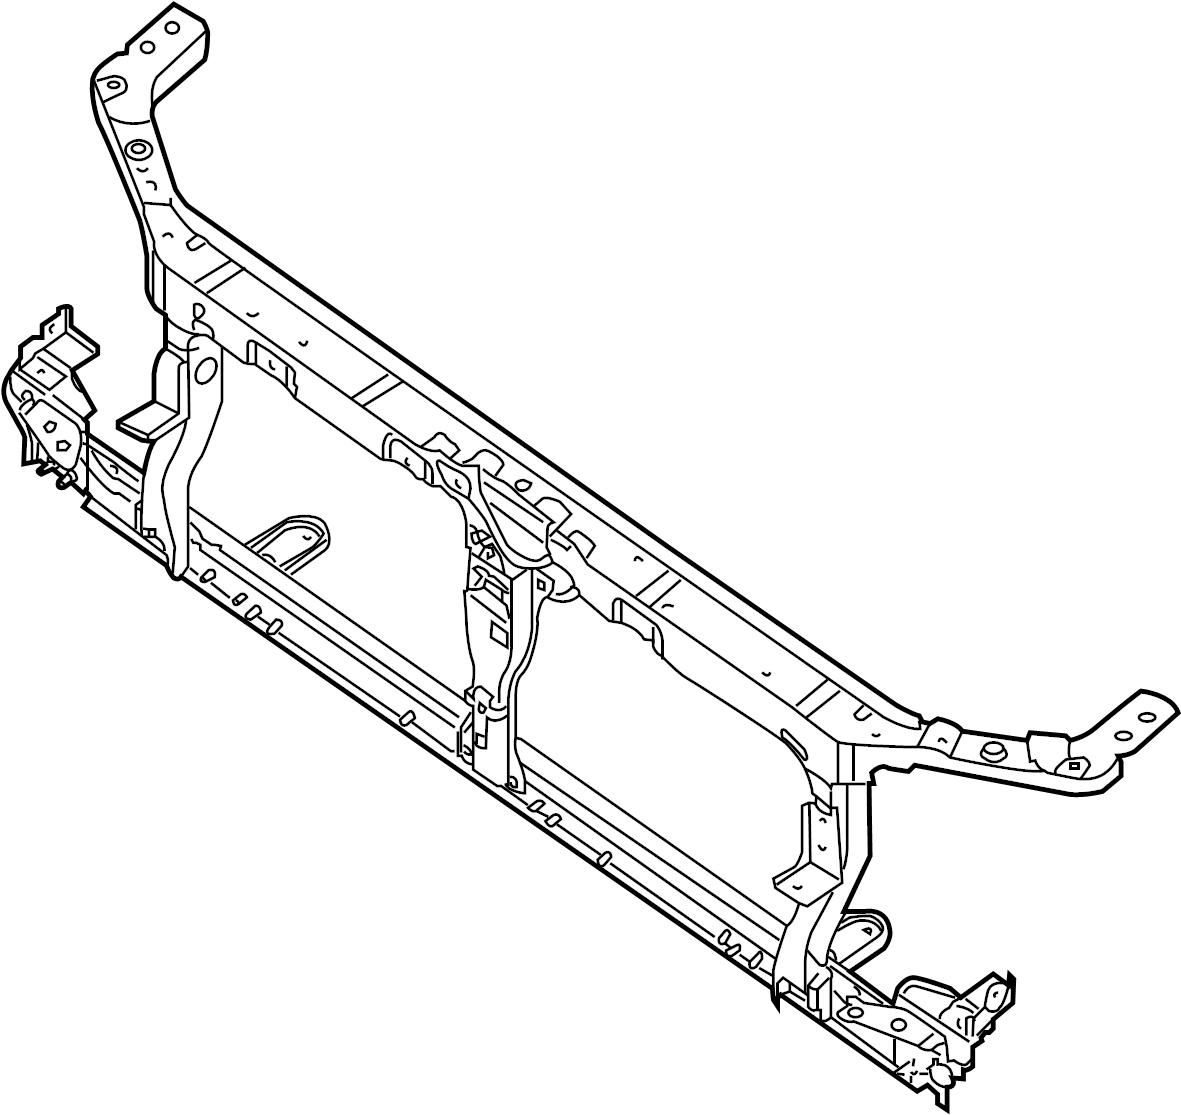 Nissan Frontier Radiator Support Panel